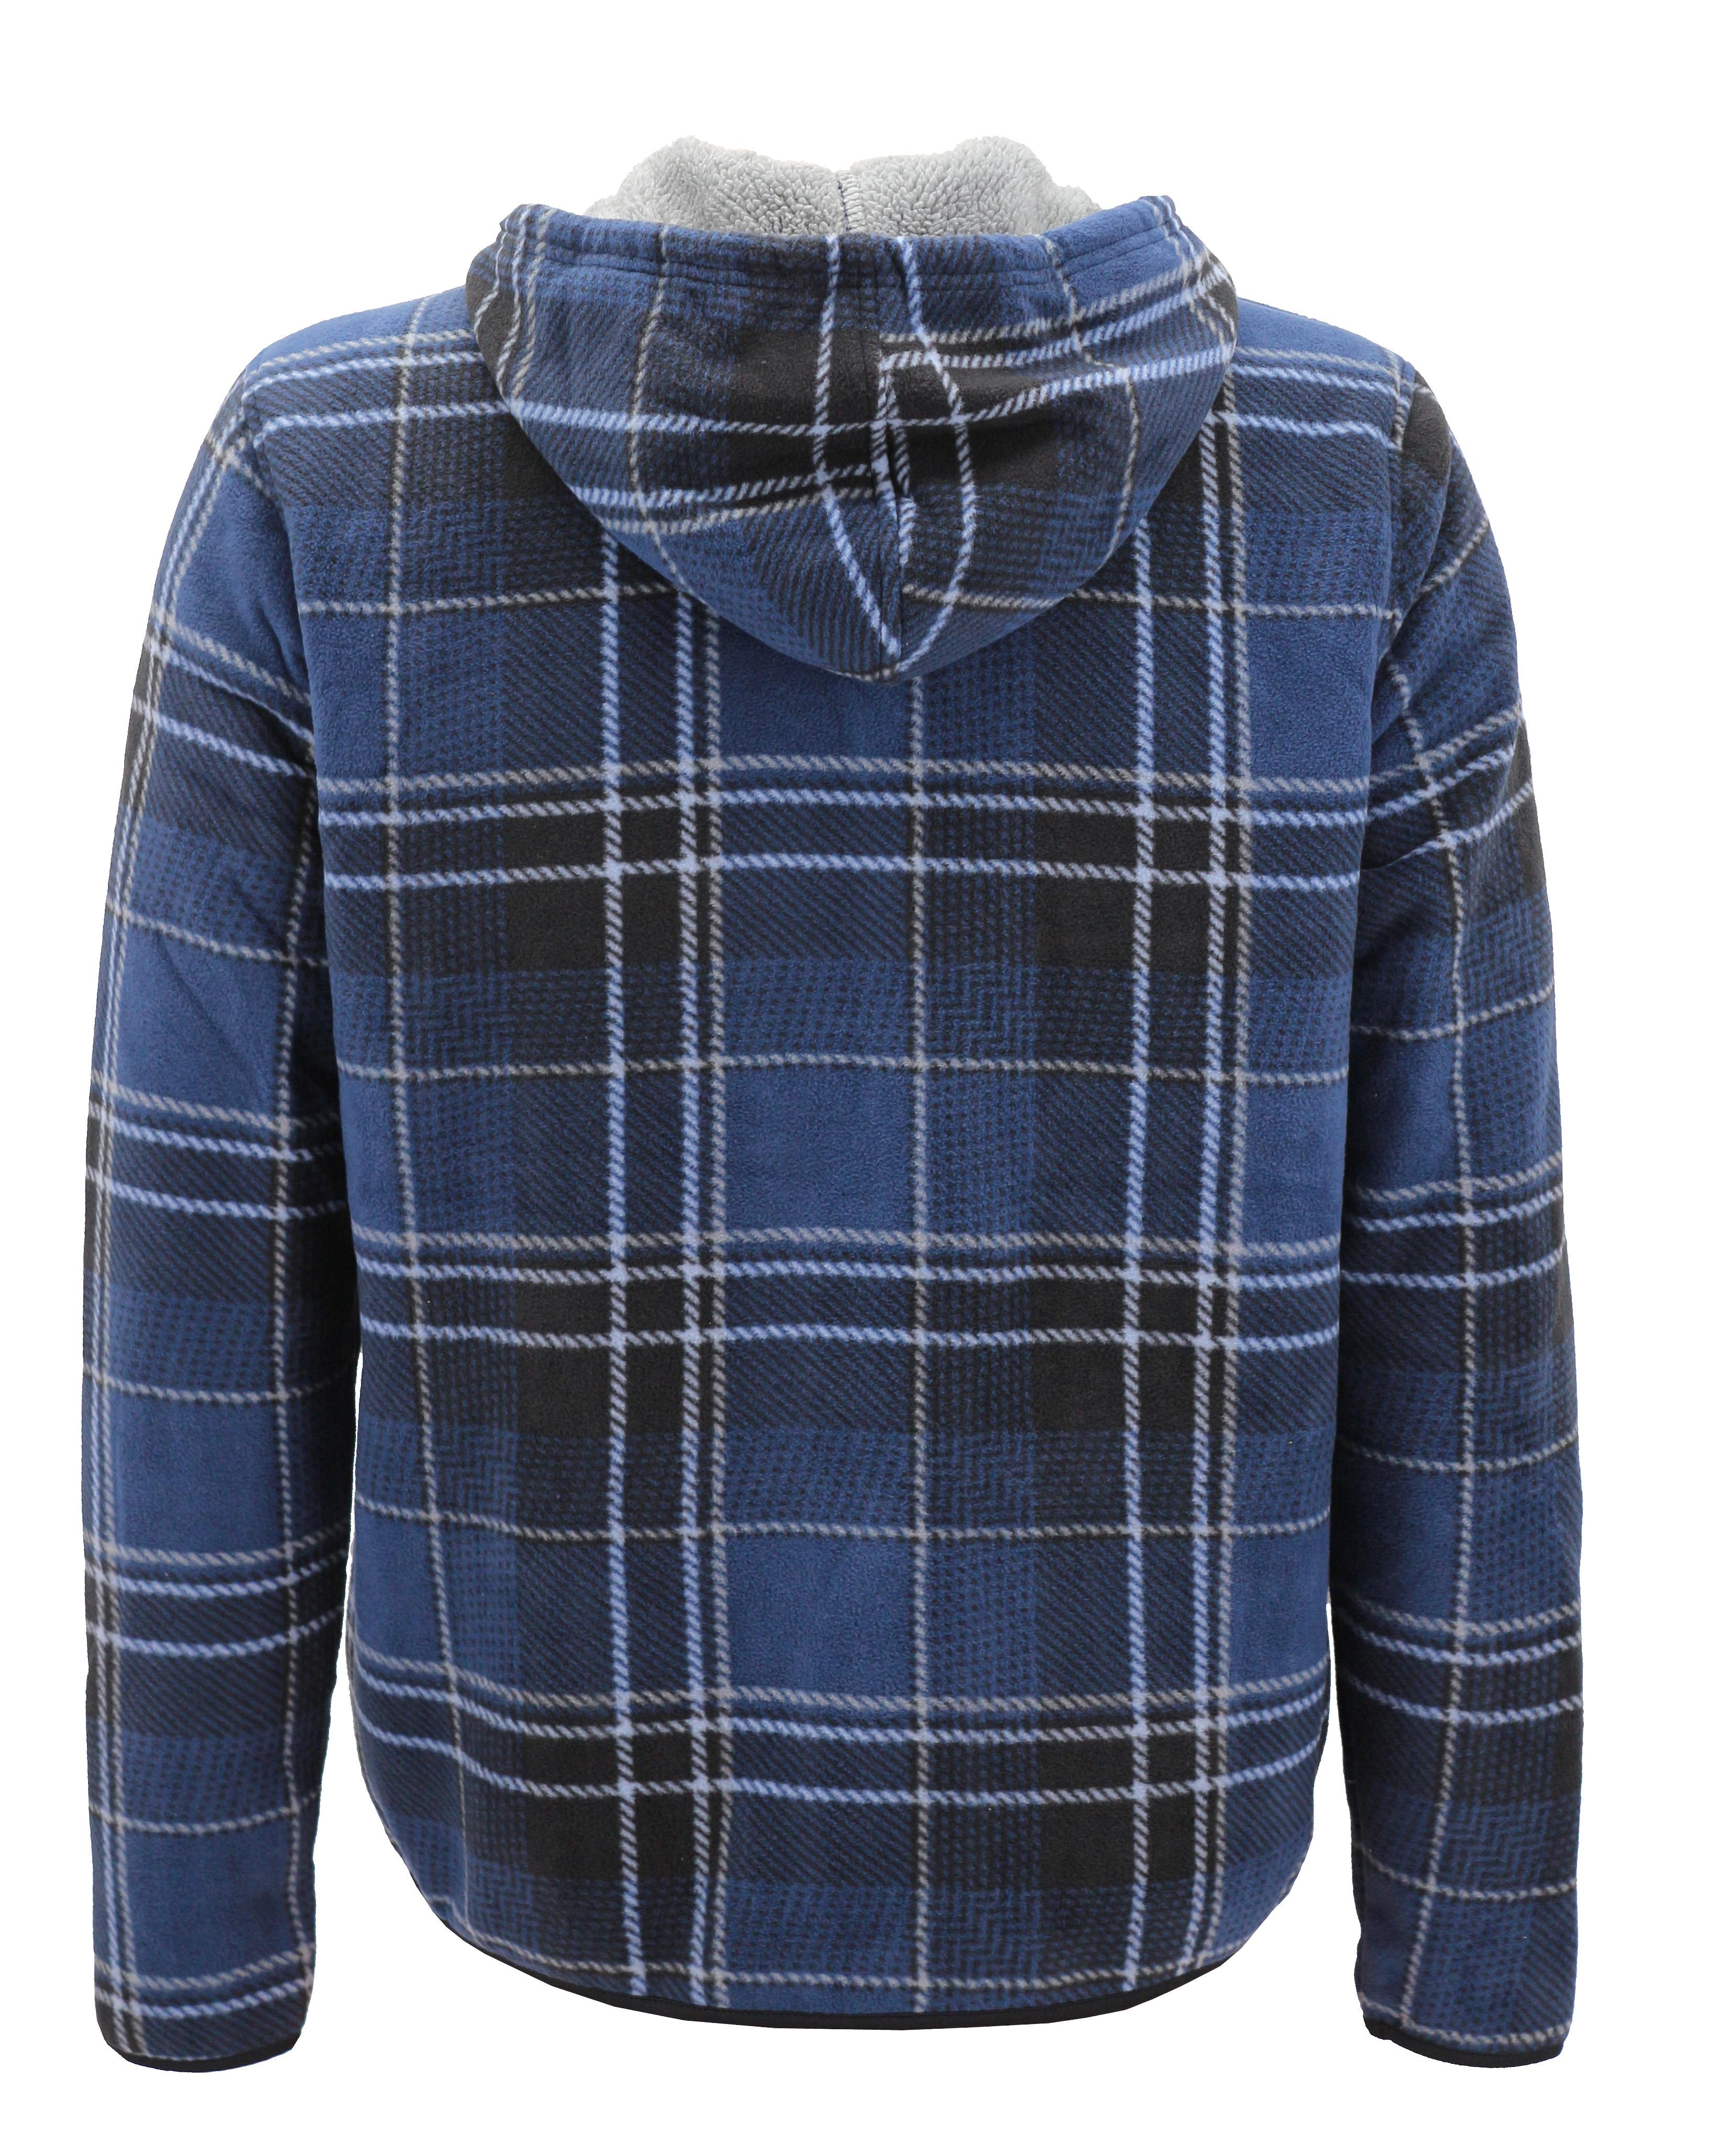 thumbnail 18 - Men-039-s-Casual-Flannel-Zip-Up-Fleece-Lined-Plaid-Sherpa-Hoodie-Lightweight-Jacket